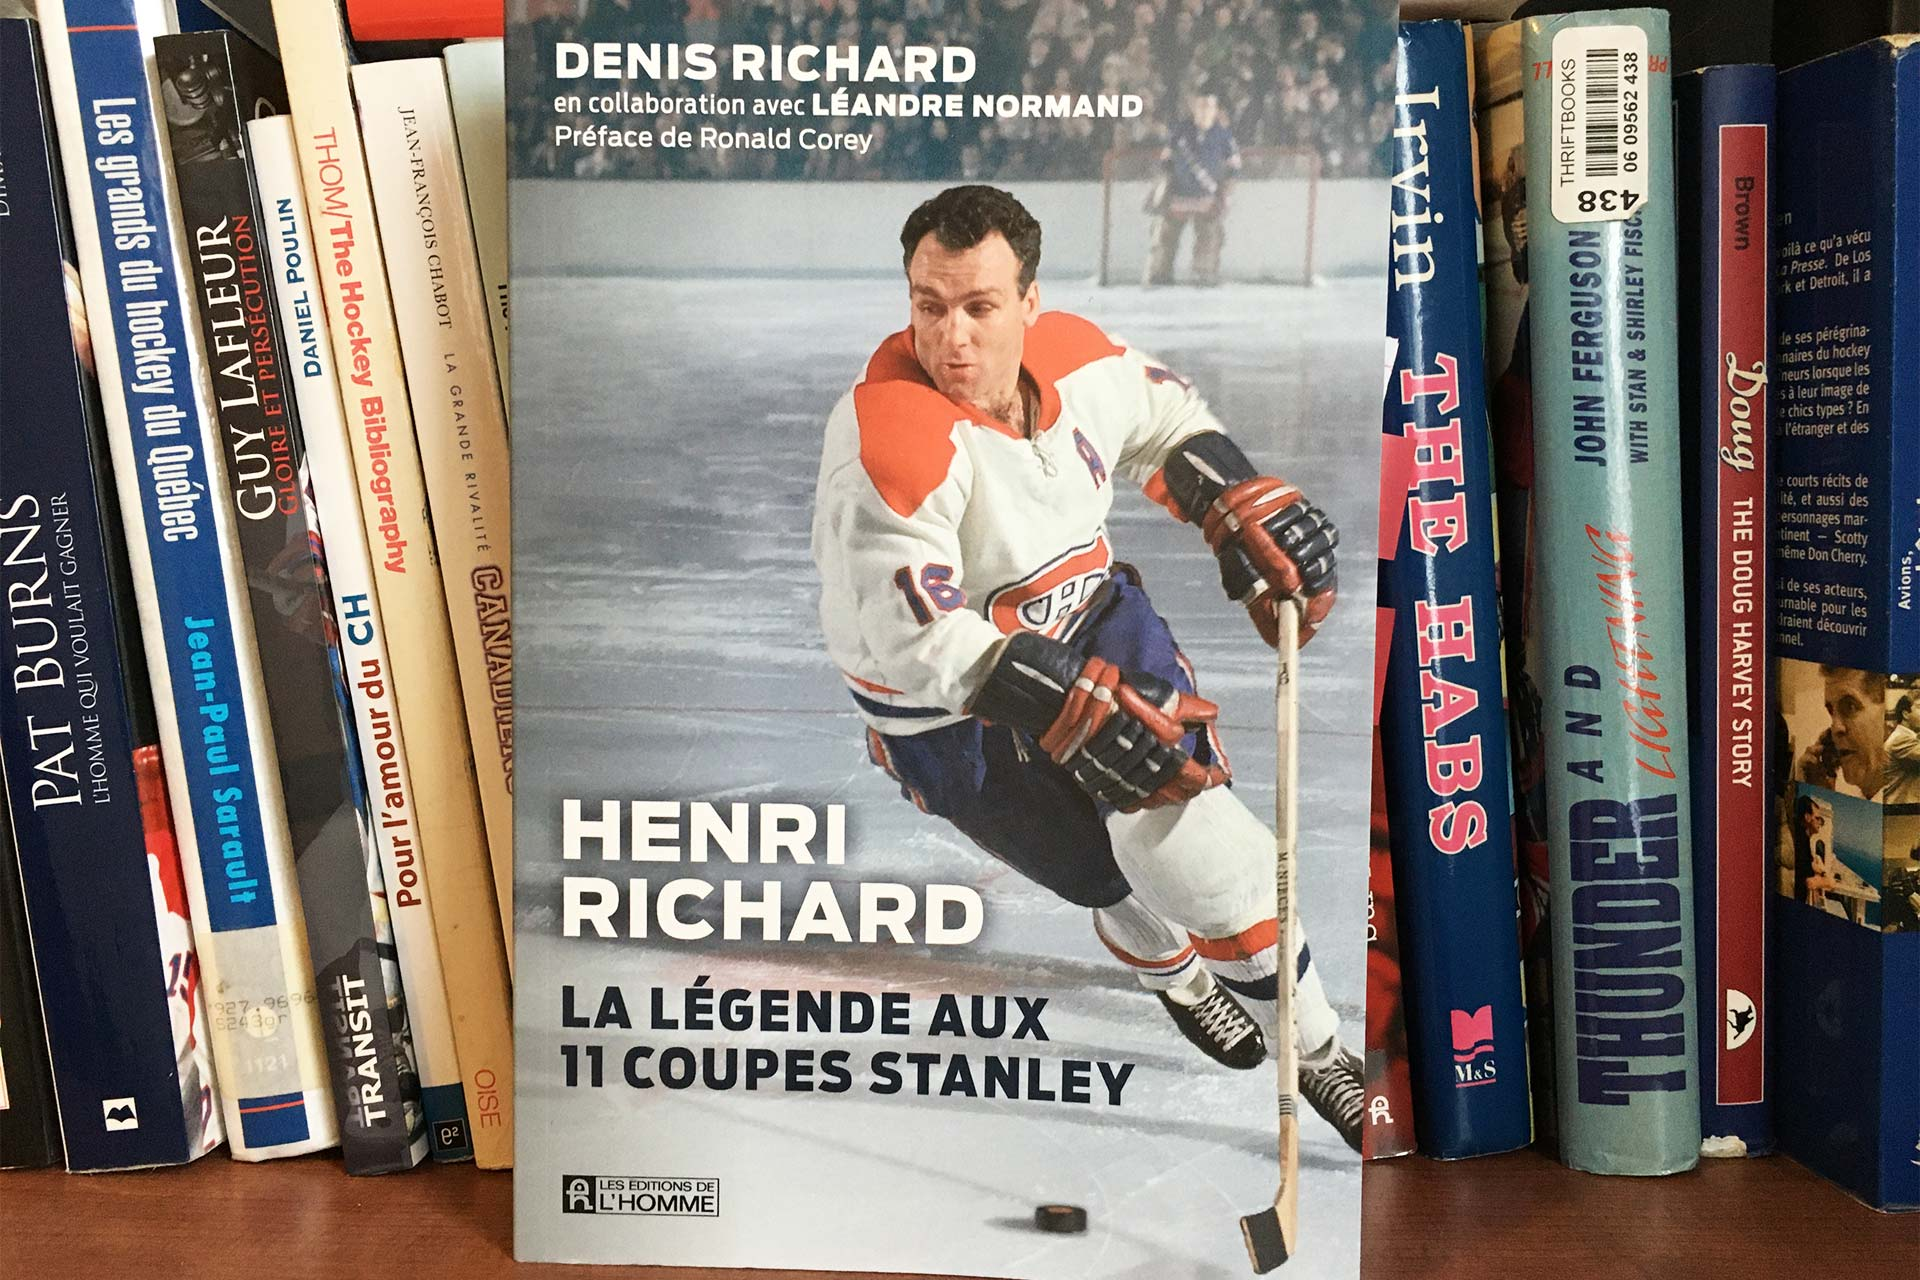 Biographie d'Henri Richard